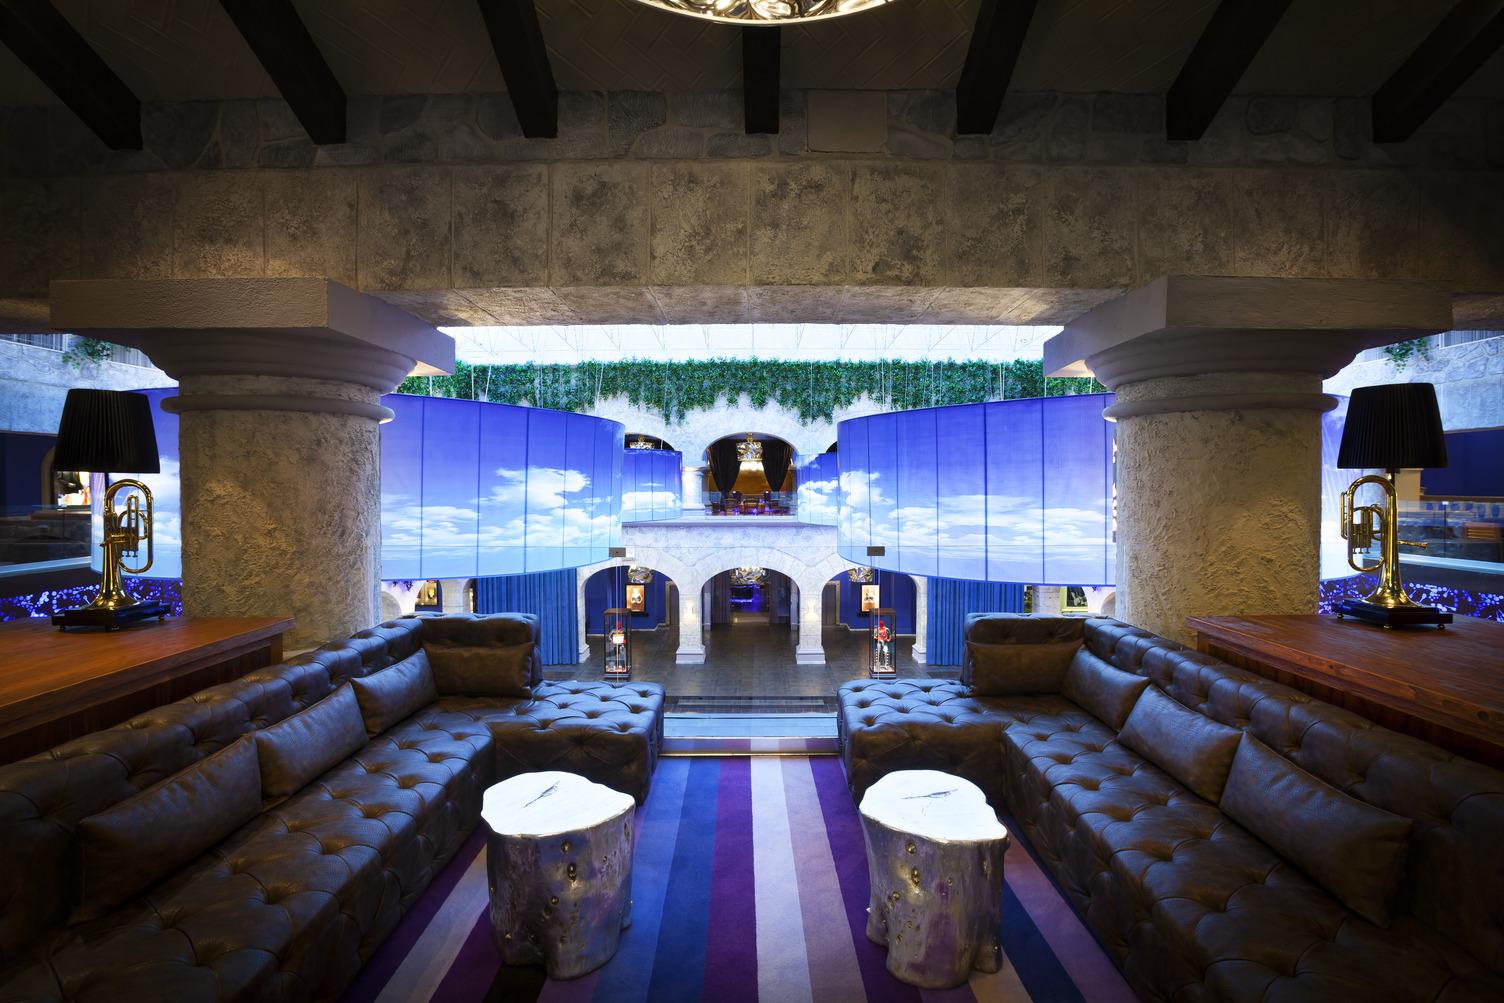 Travel Agency All-Inclusive Resort Heaven at Hard Rock Hotel Riviera Maya 24